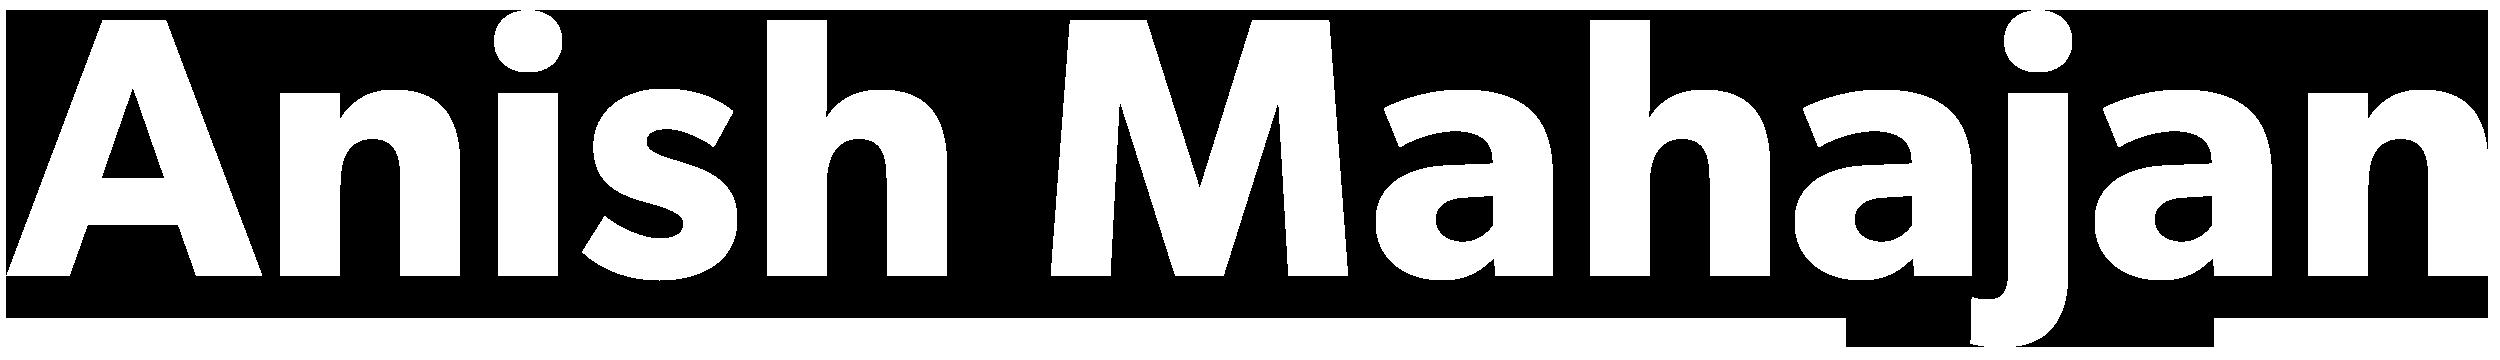 Anish Mahajan Logo